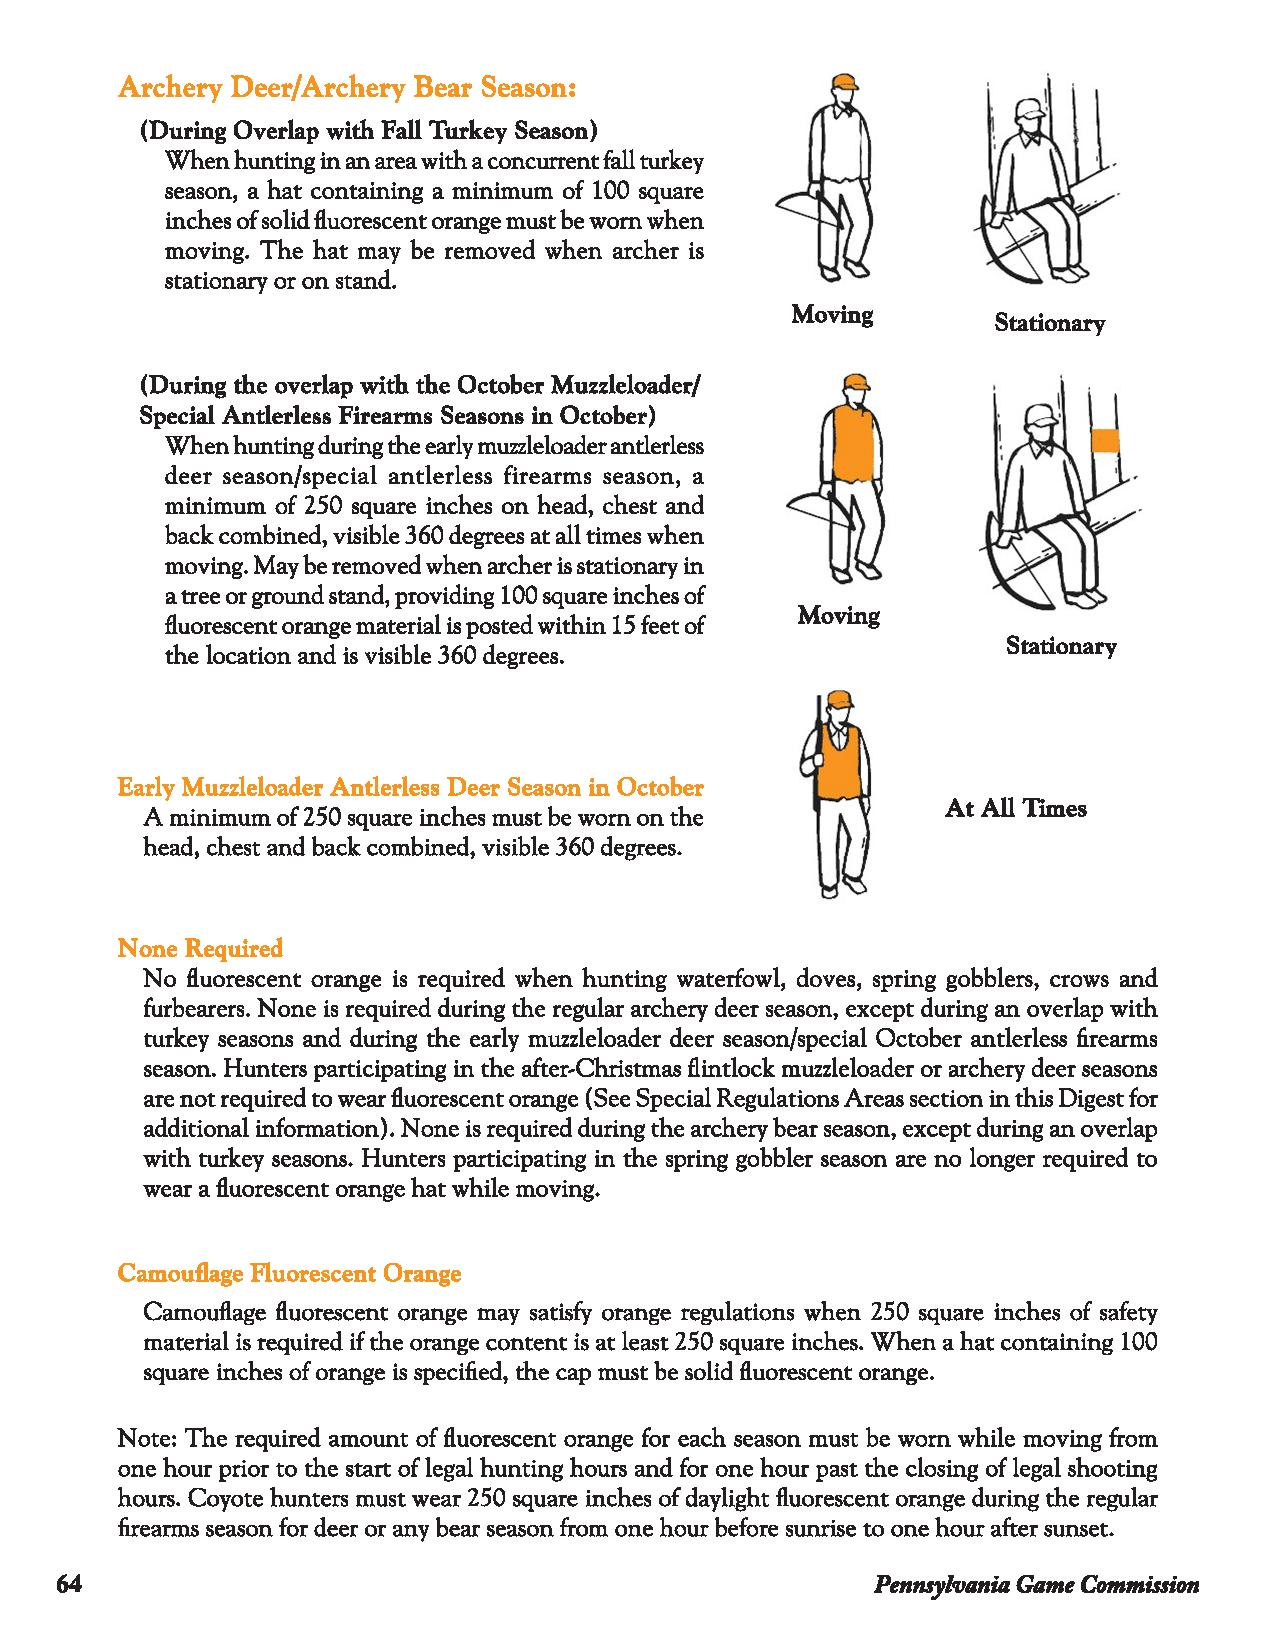 Pennsylvania Fluorescent Orange Requirement Charts